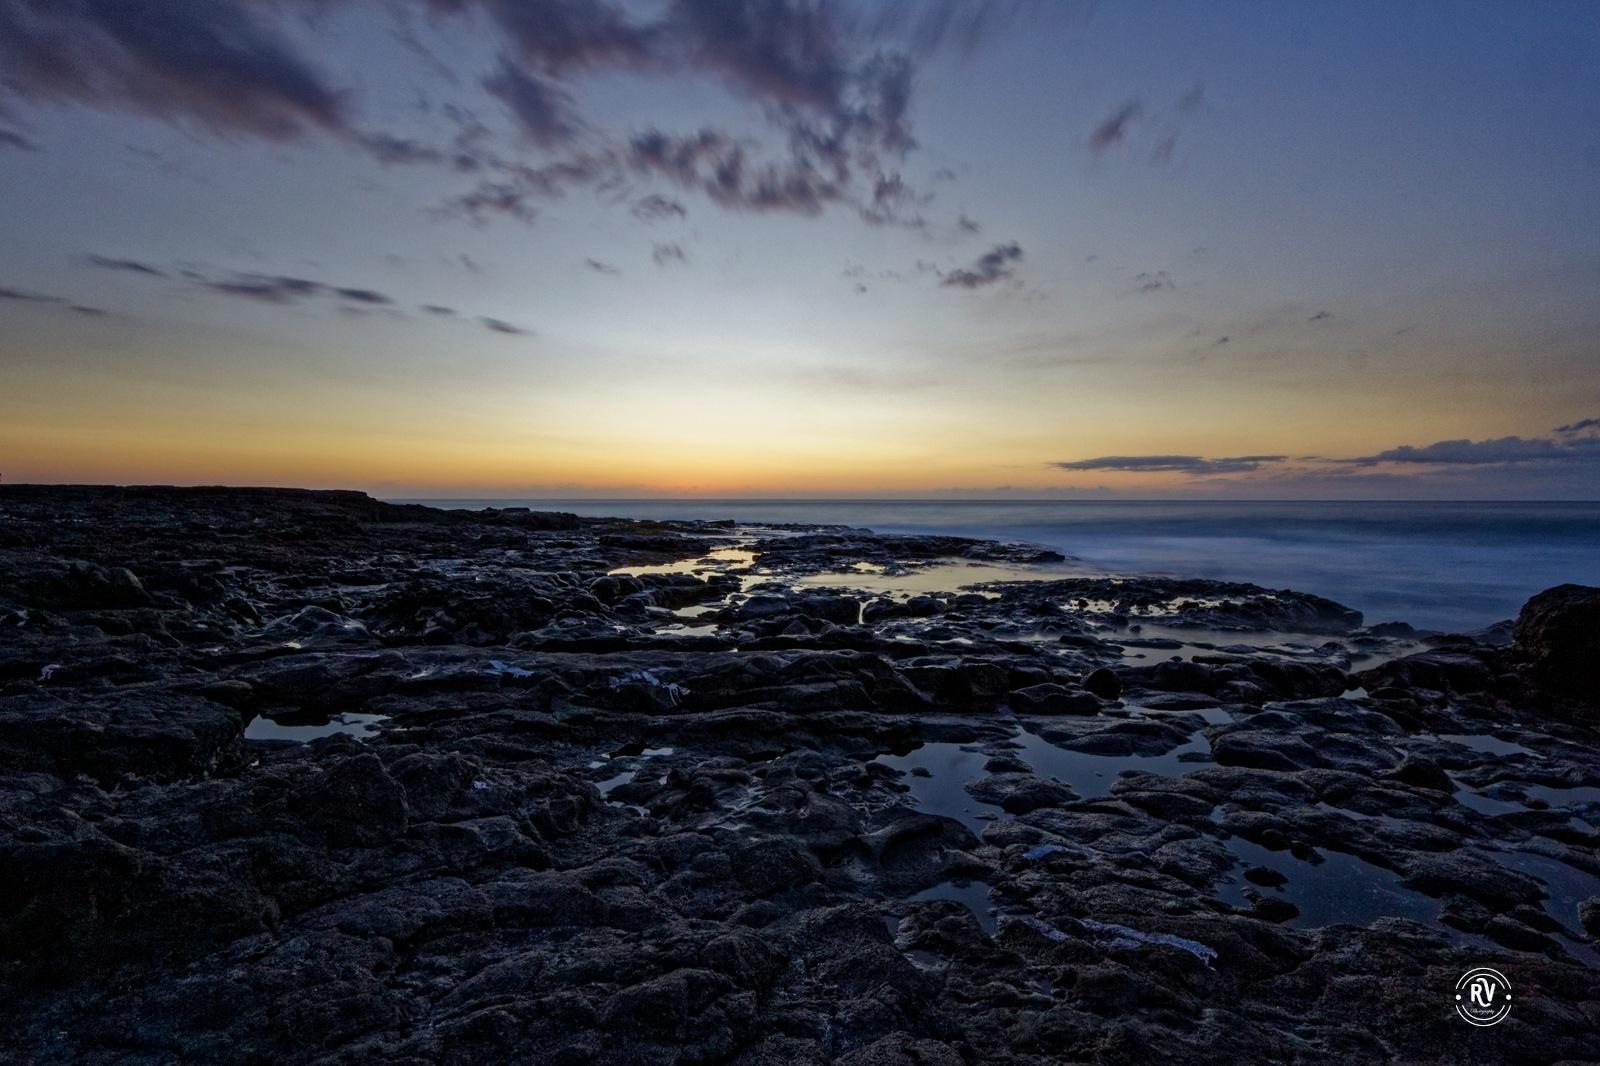 PEACEFUL SUNSET by rverguin